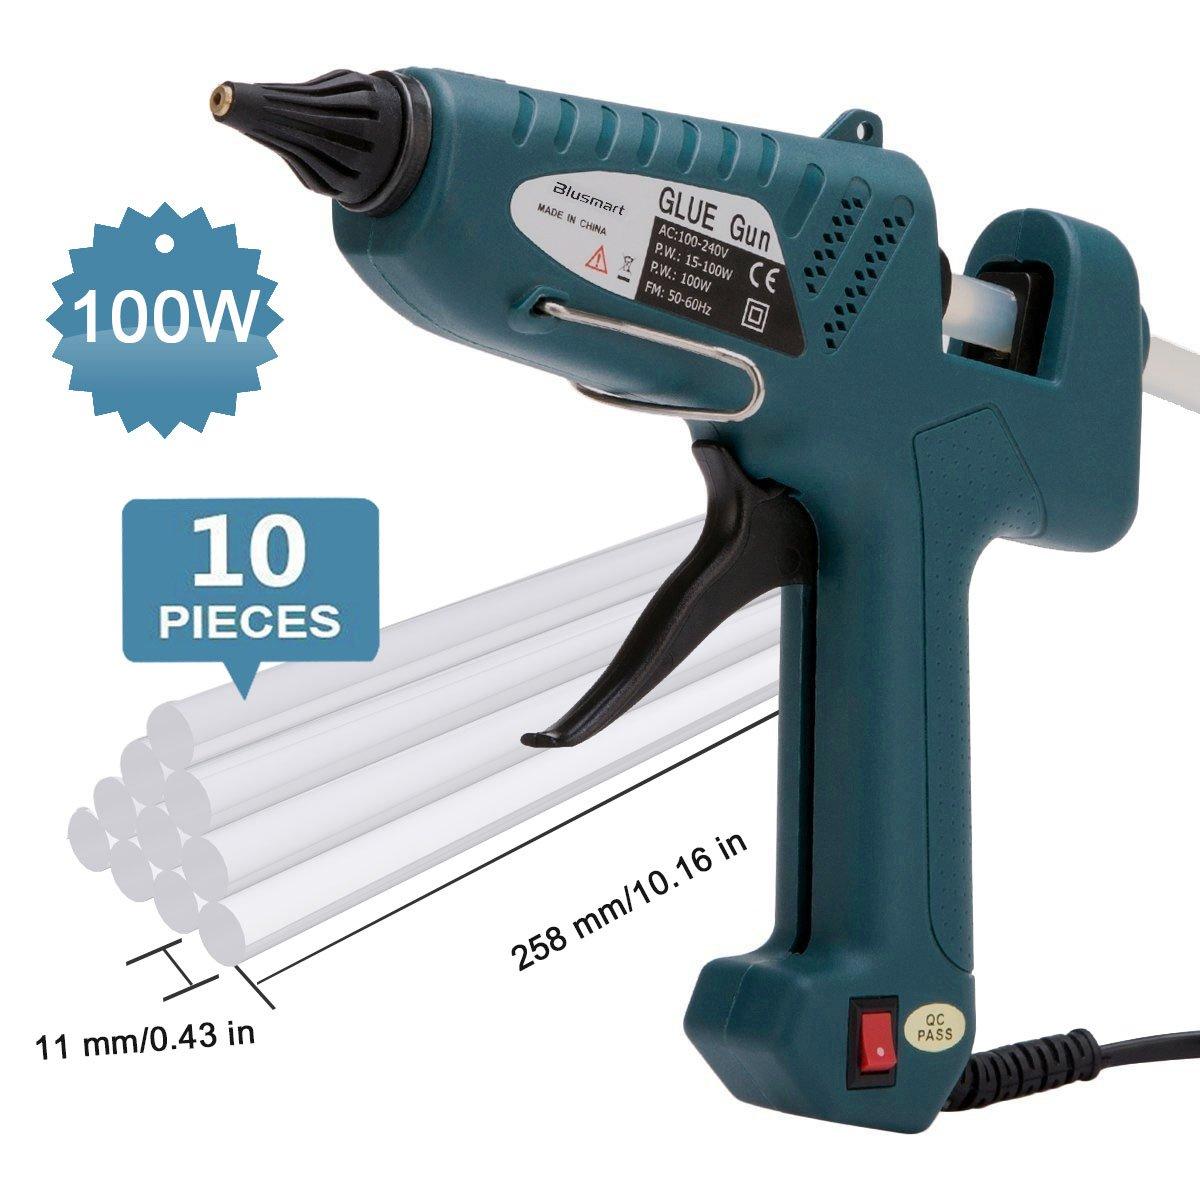 Hot Glue Gun , Blusmart 100-Watt Industrial Glue Gun High Temperature Hot Melt Glue Gun with 10pcs Glue Sticks,Dark Green